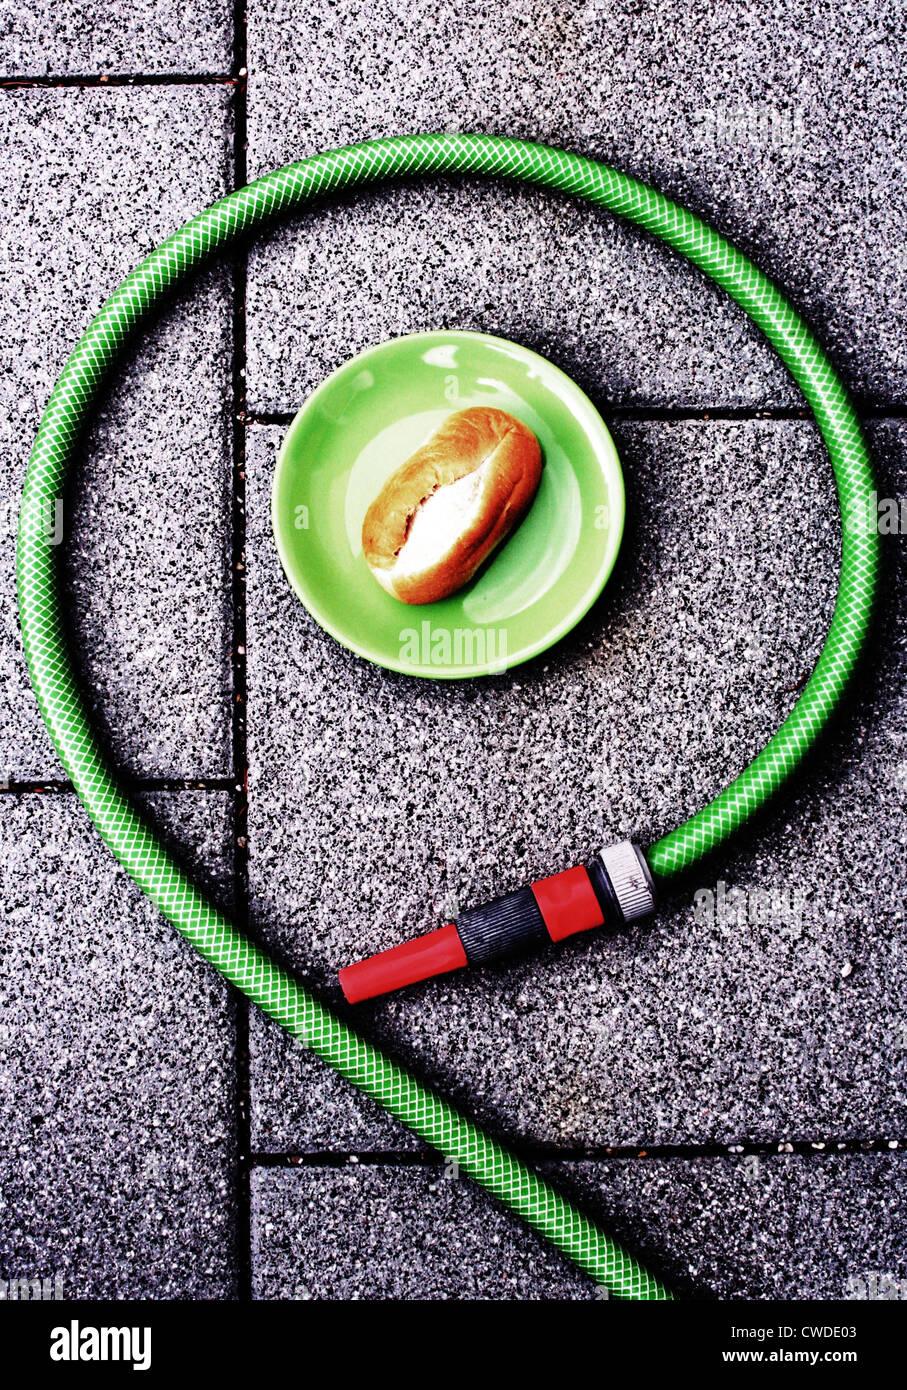 plate,bun,garden hose - Stock Image